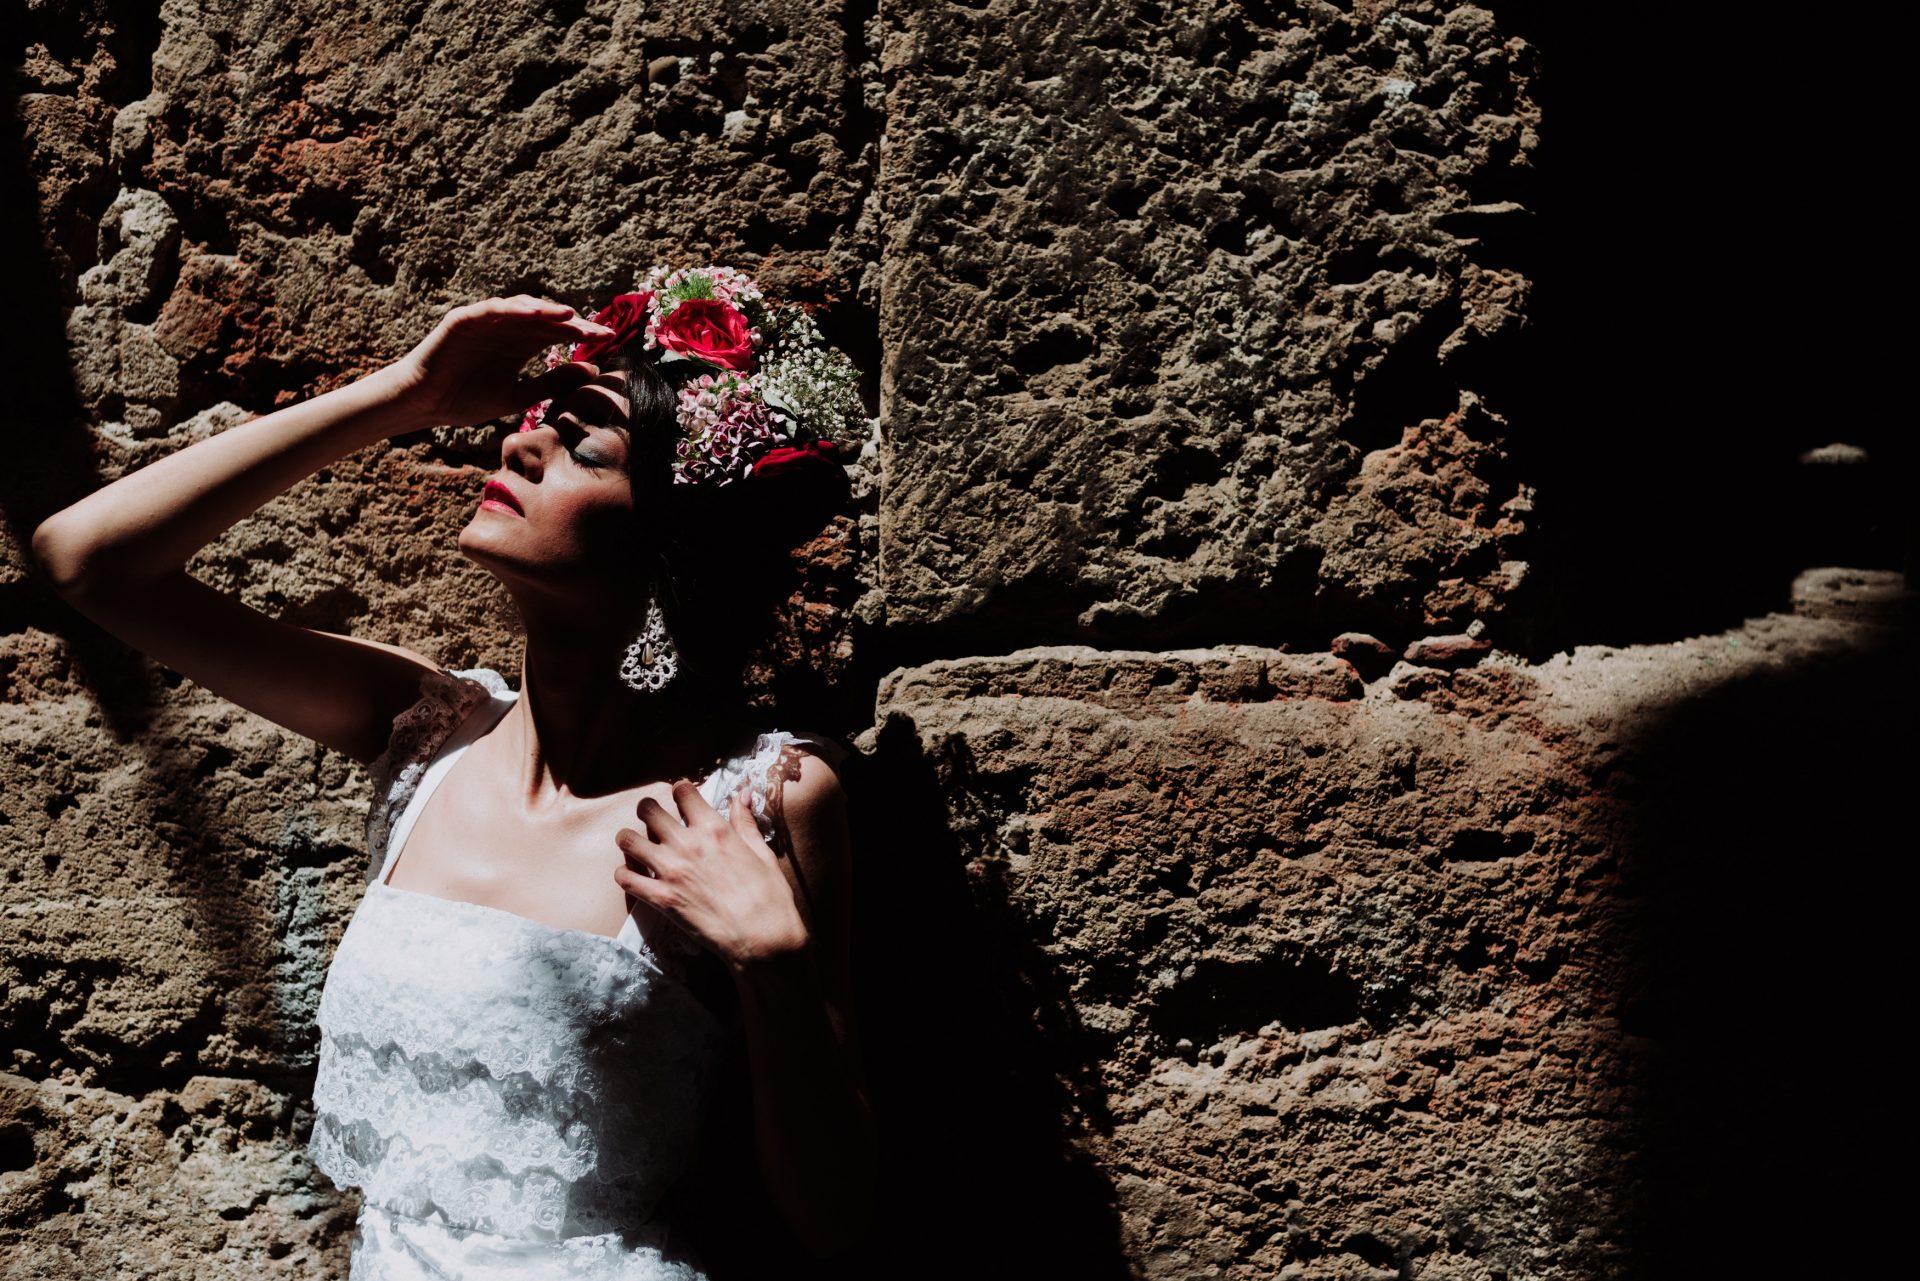 wedding photographer in sicily, portrait photographer, frida khalo, dolce e gabbana